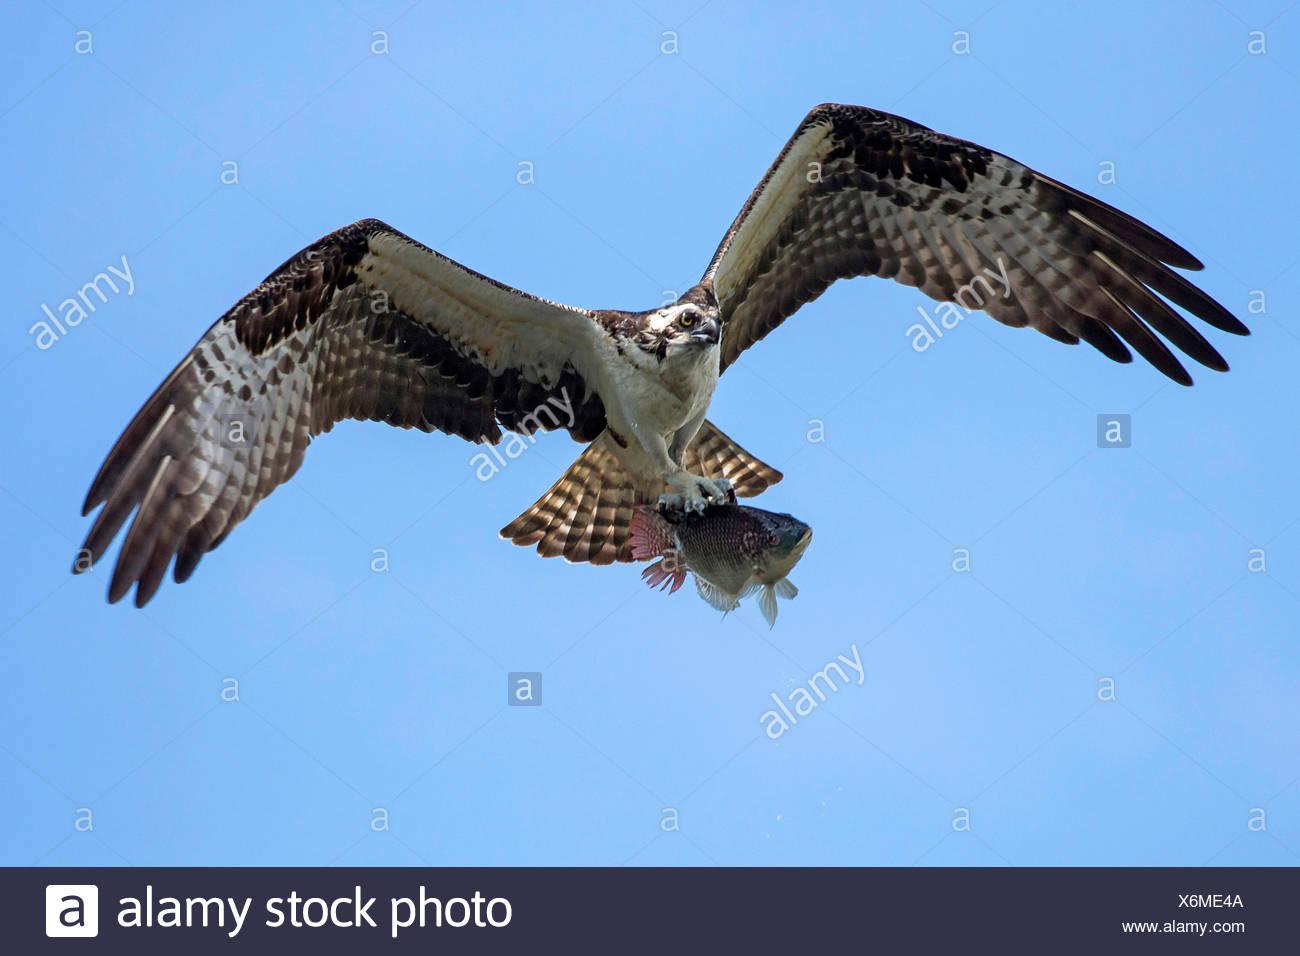 osprey, fish hawk (Pandion haliaetus), flying with caught Tilapia, USA, Florida, Kissimmee - Stock Image